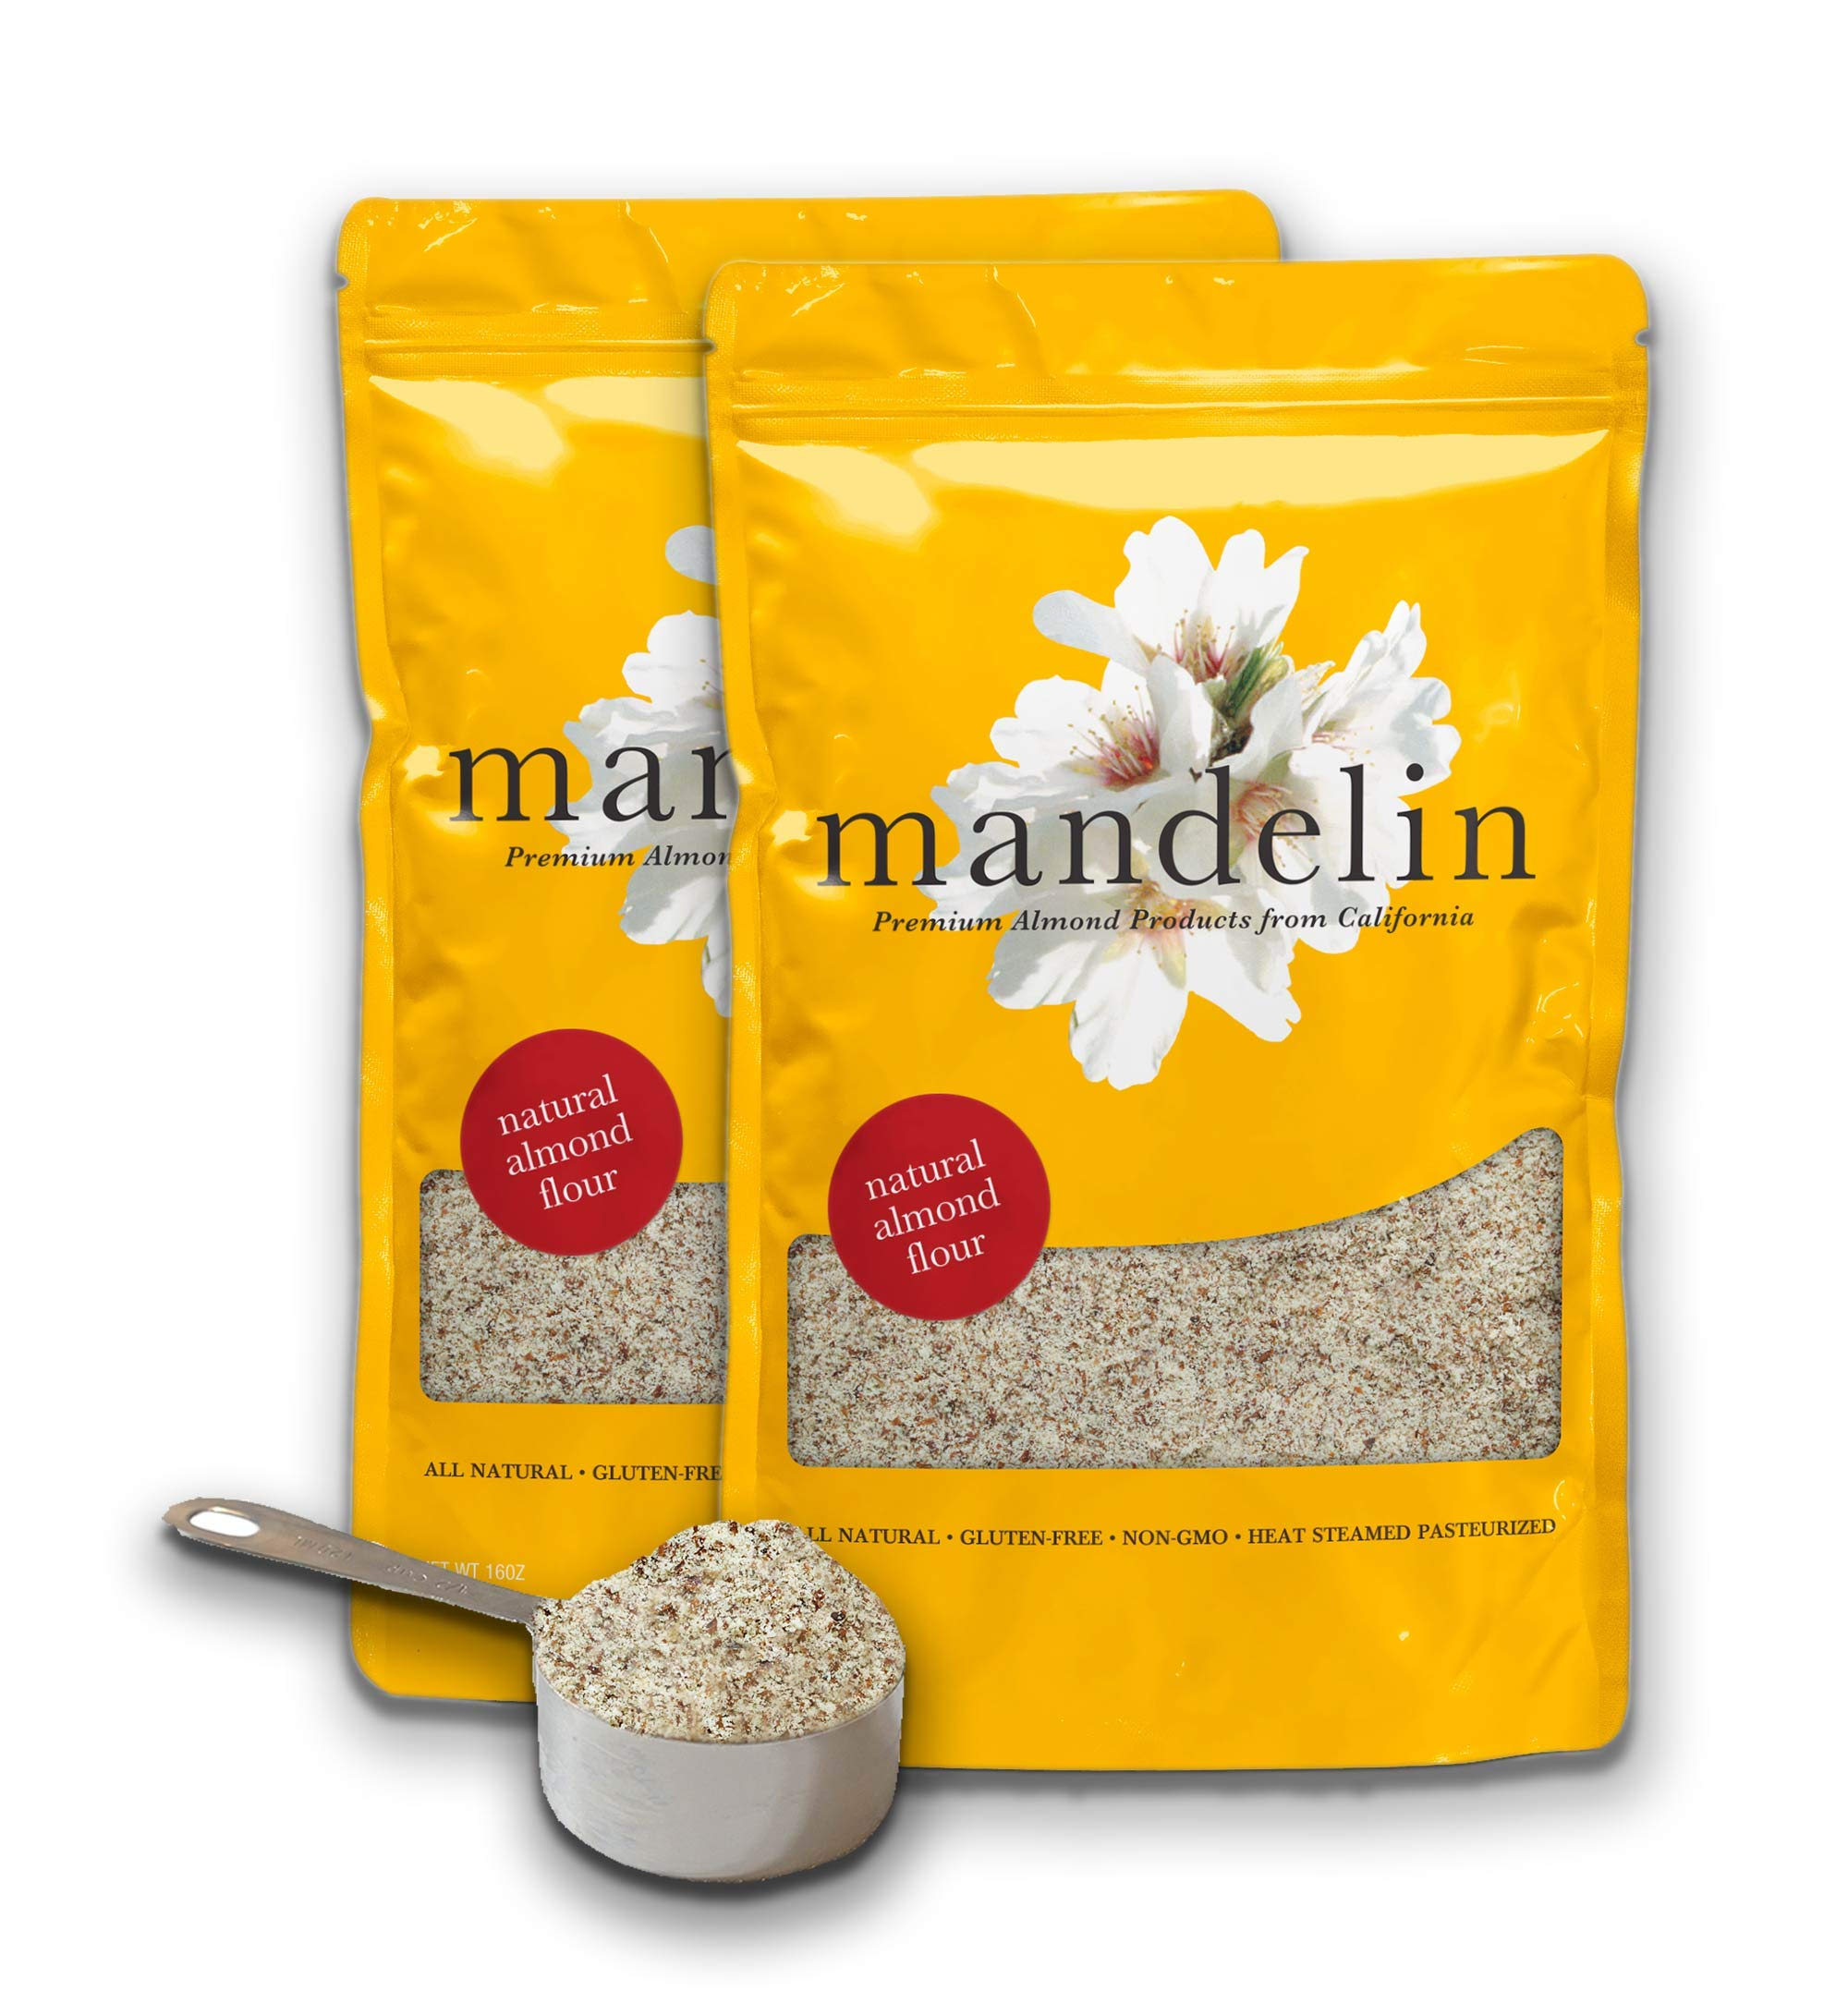 Mandelin Fresh Natural Almond Flour - 100% Almond Flour / Meal, With Skin, Super Fine Mill, Non-GMO, Gluten Free, Vegan, Keto, Plant Based Diet Friendly (2 lb)